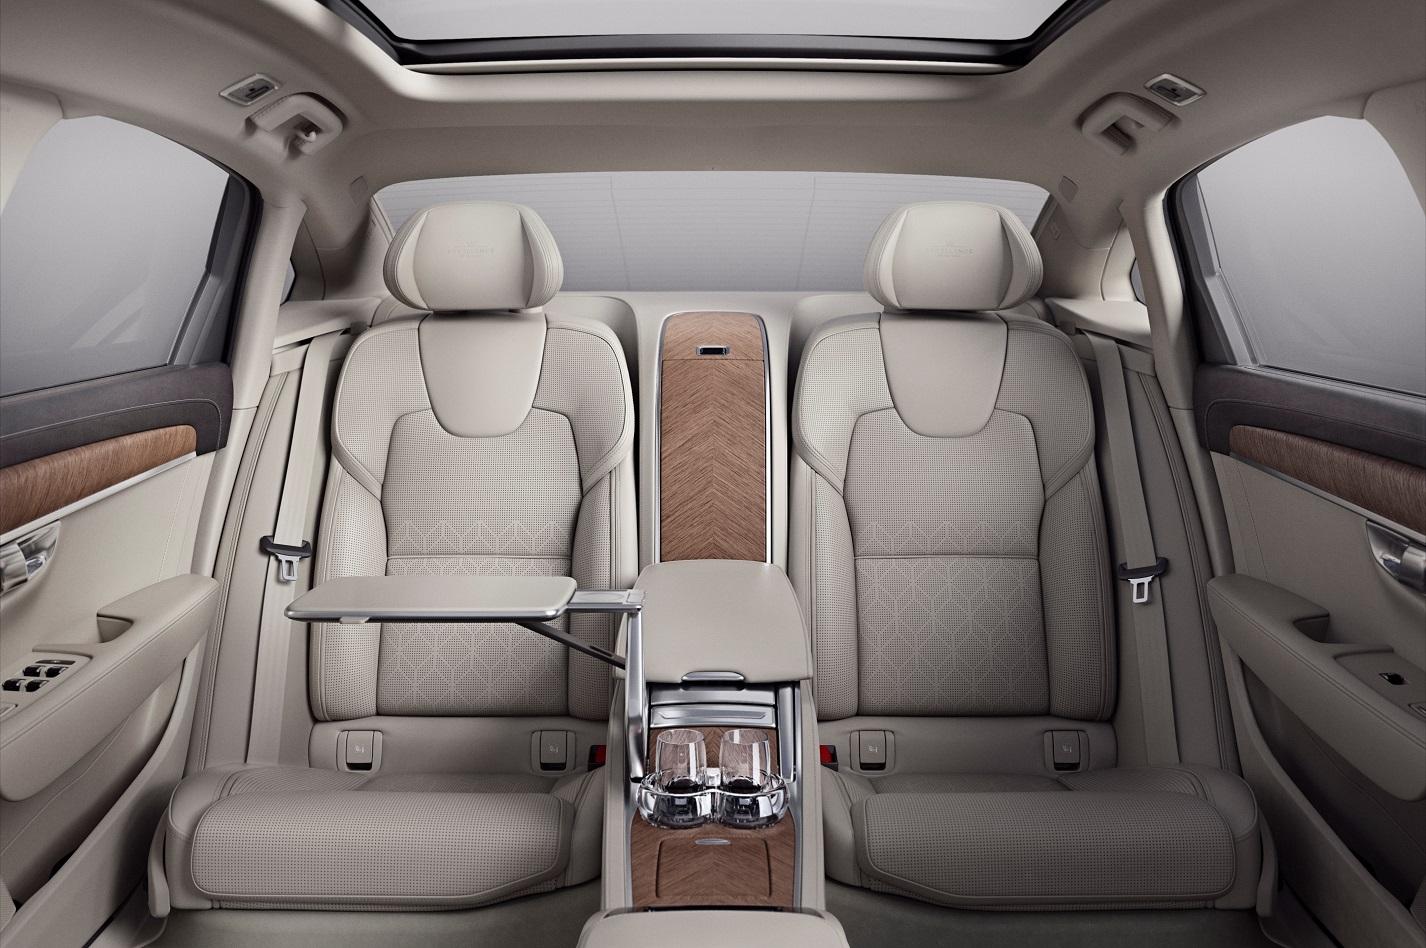 VOLVO2BS902BEXCELLENCE INTERIOR2B2 H Volvo αυξάνει την παραγωγή της και αλλάζει στρατηγική για τα εργοστάσιά της σε Ευρώπη, Κίνα, ΗΠΑ Volvo, Volvo Cars, Volvo S90, Volvo S90 Excellence, αγορά, Τεχνολογία